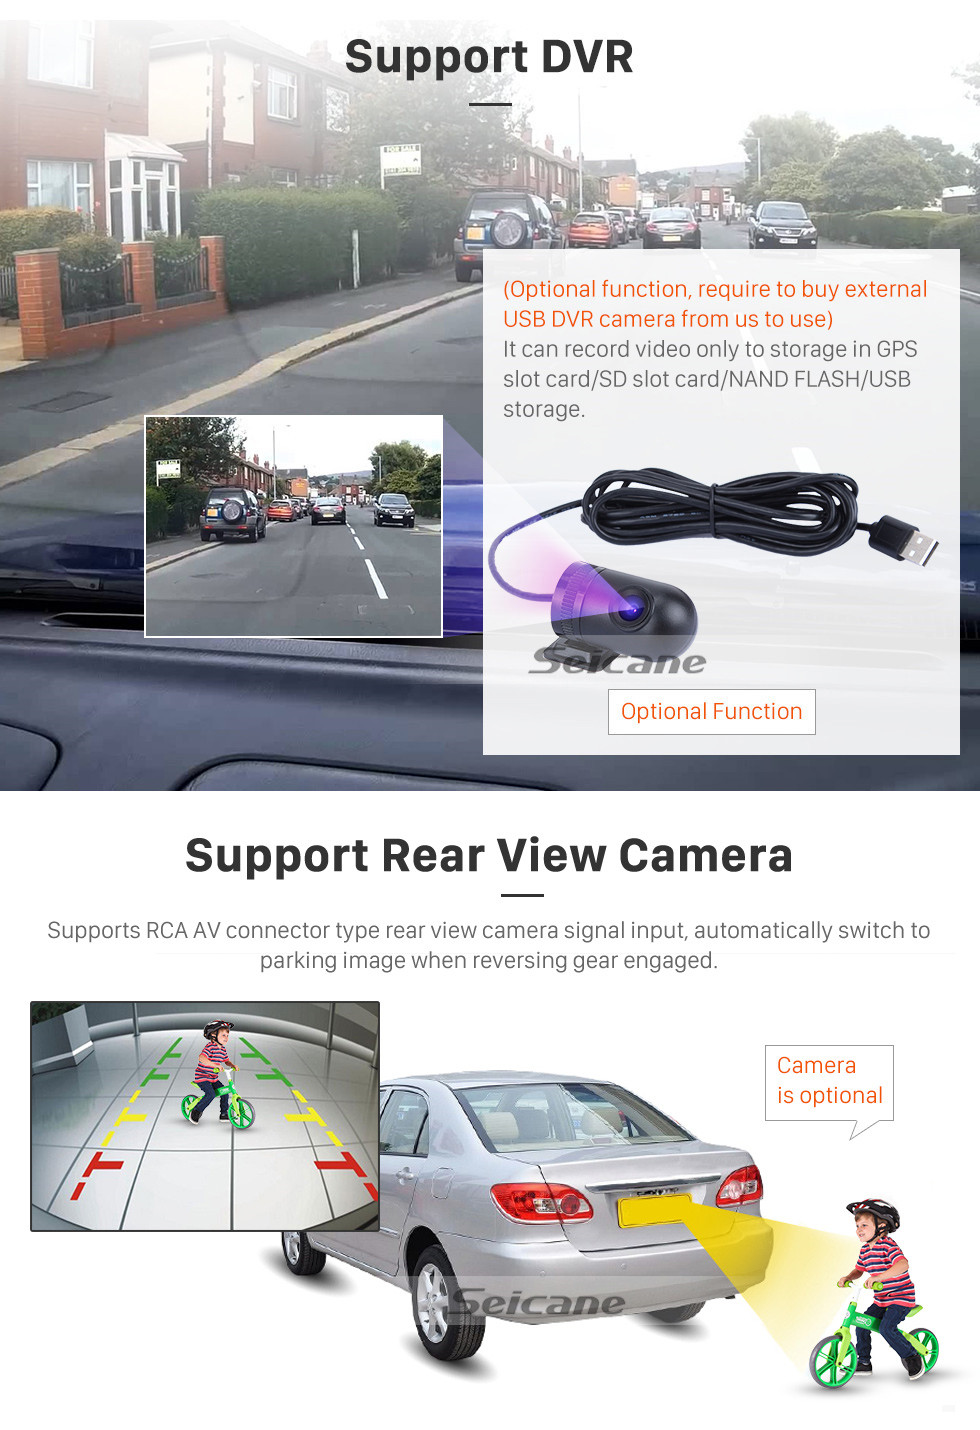 Seicane 10.1 inch For 2006 Toyota Previa/Estima/Tarago Radio Android 10.0 GPS Navigation System Bluetooth HD Touchscreen Carplay support OBD2